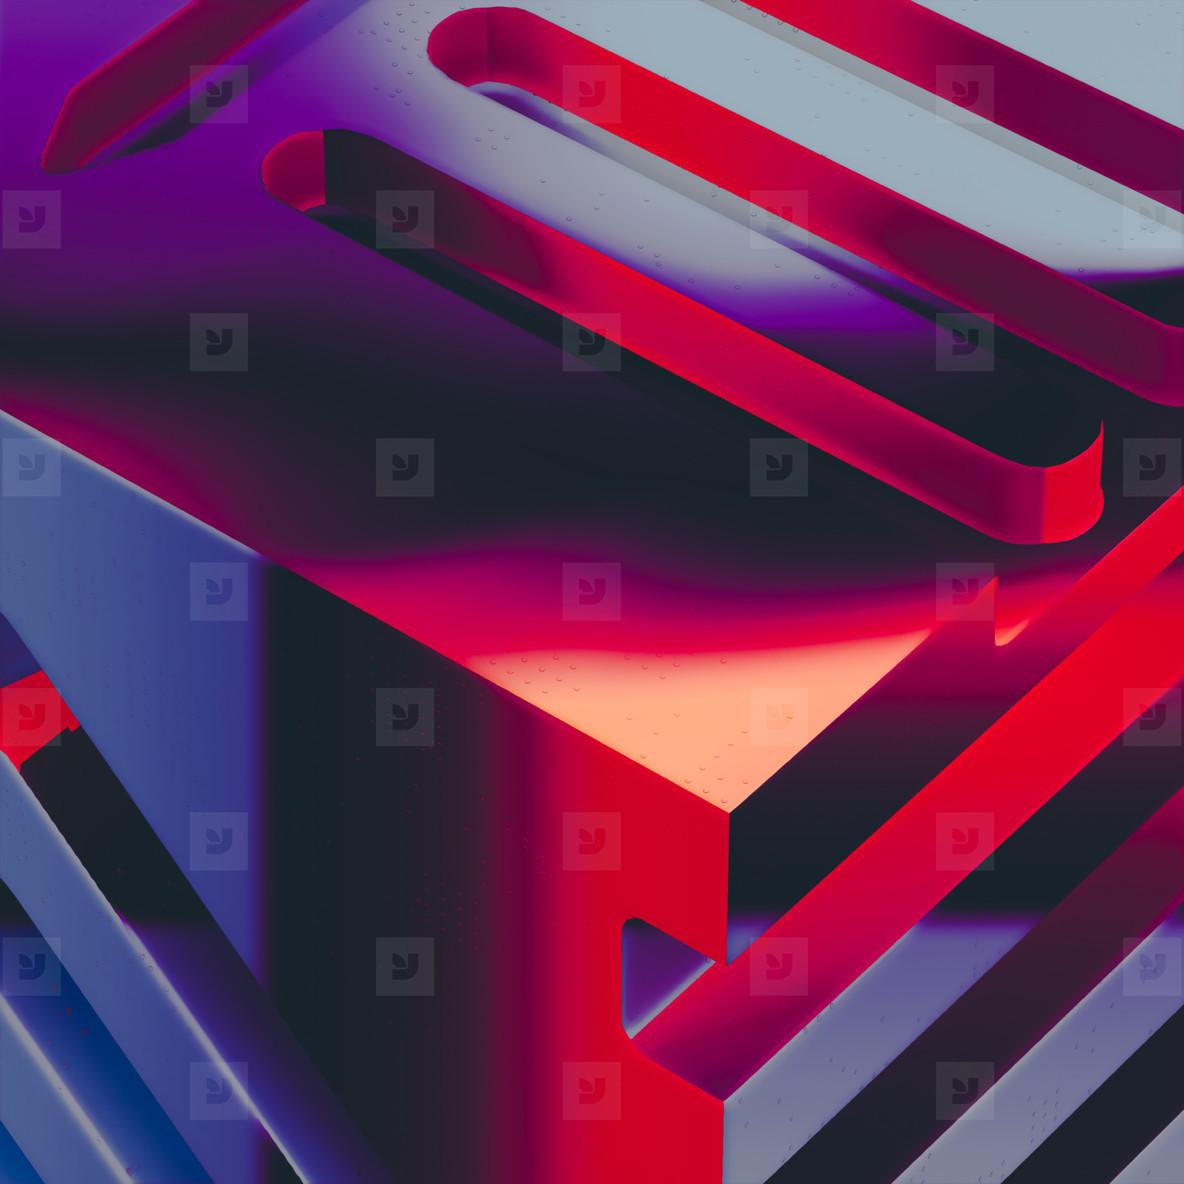 Cubed Gradients 7